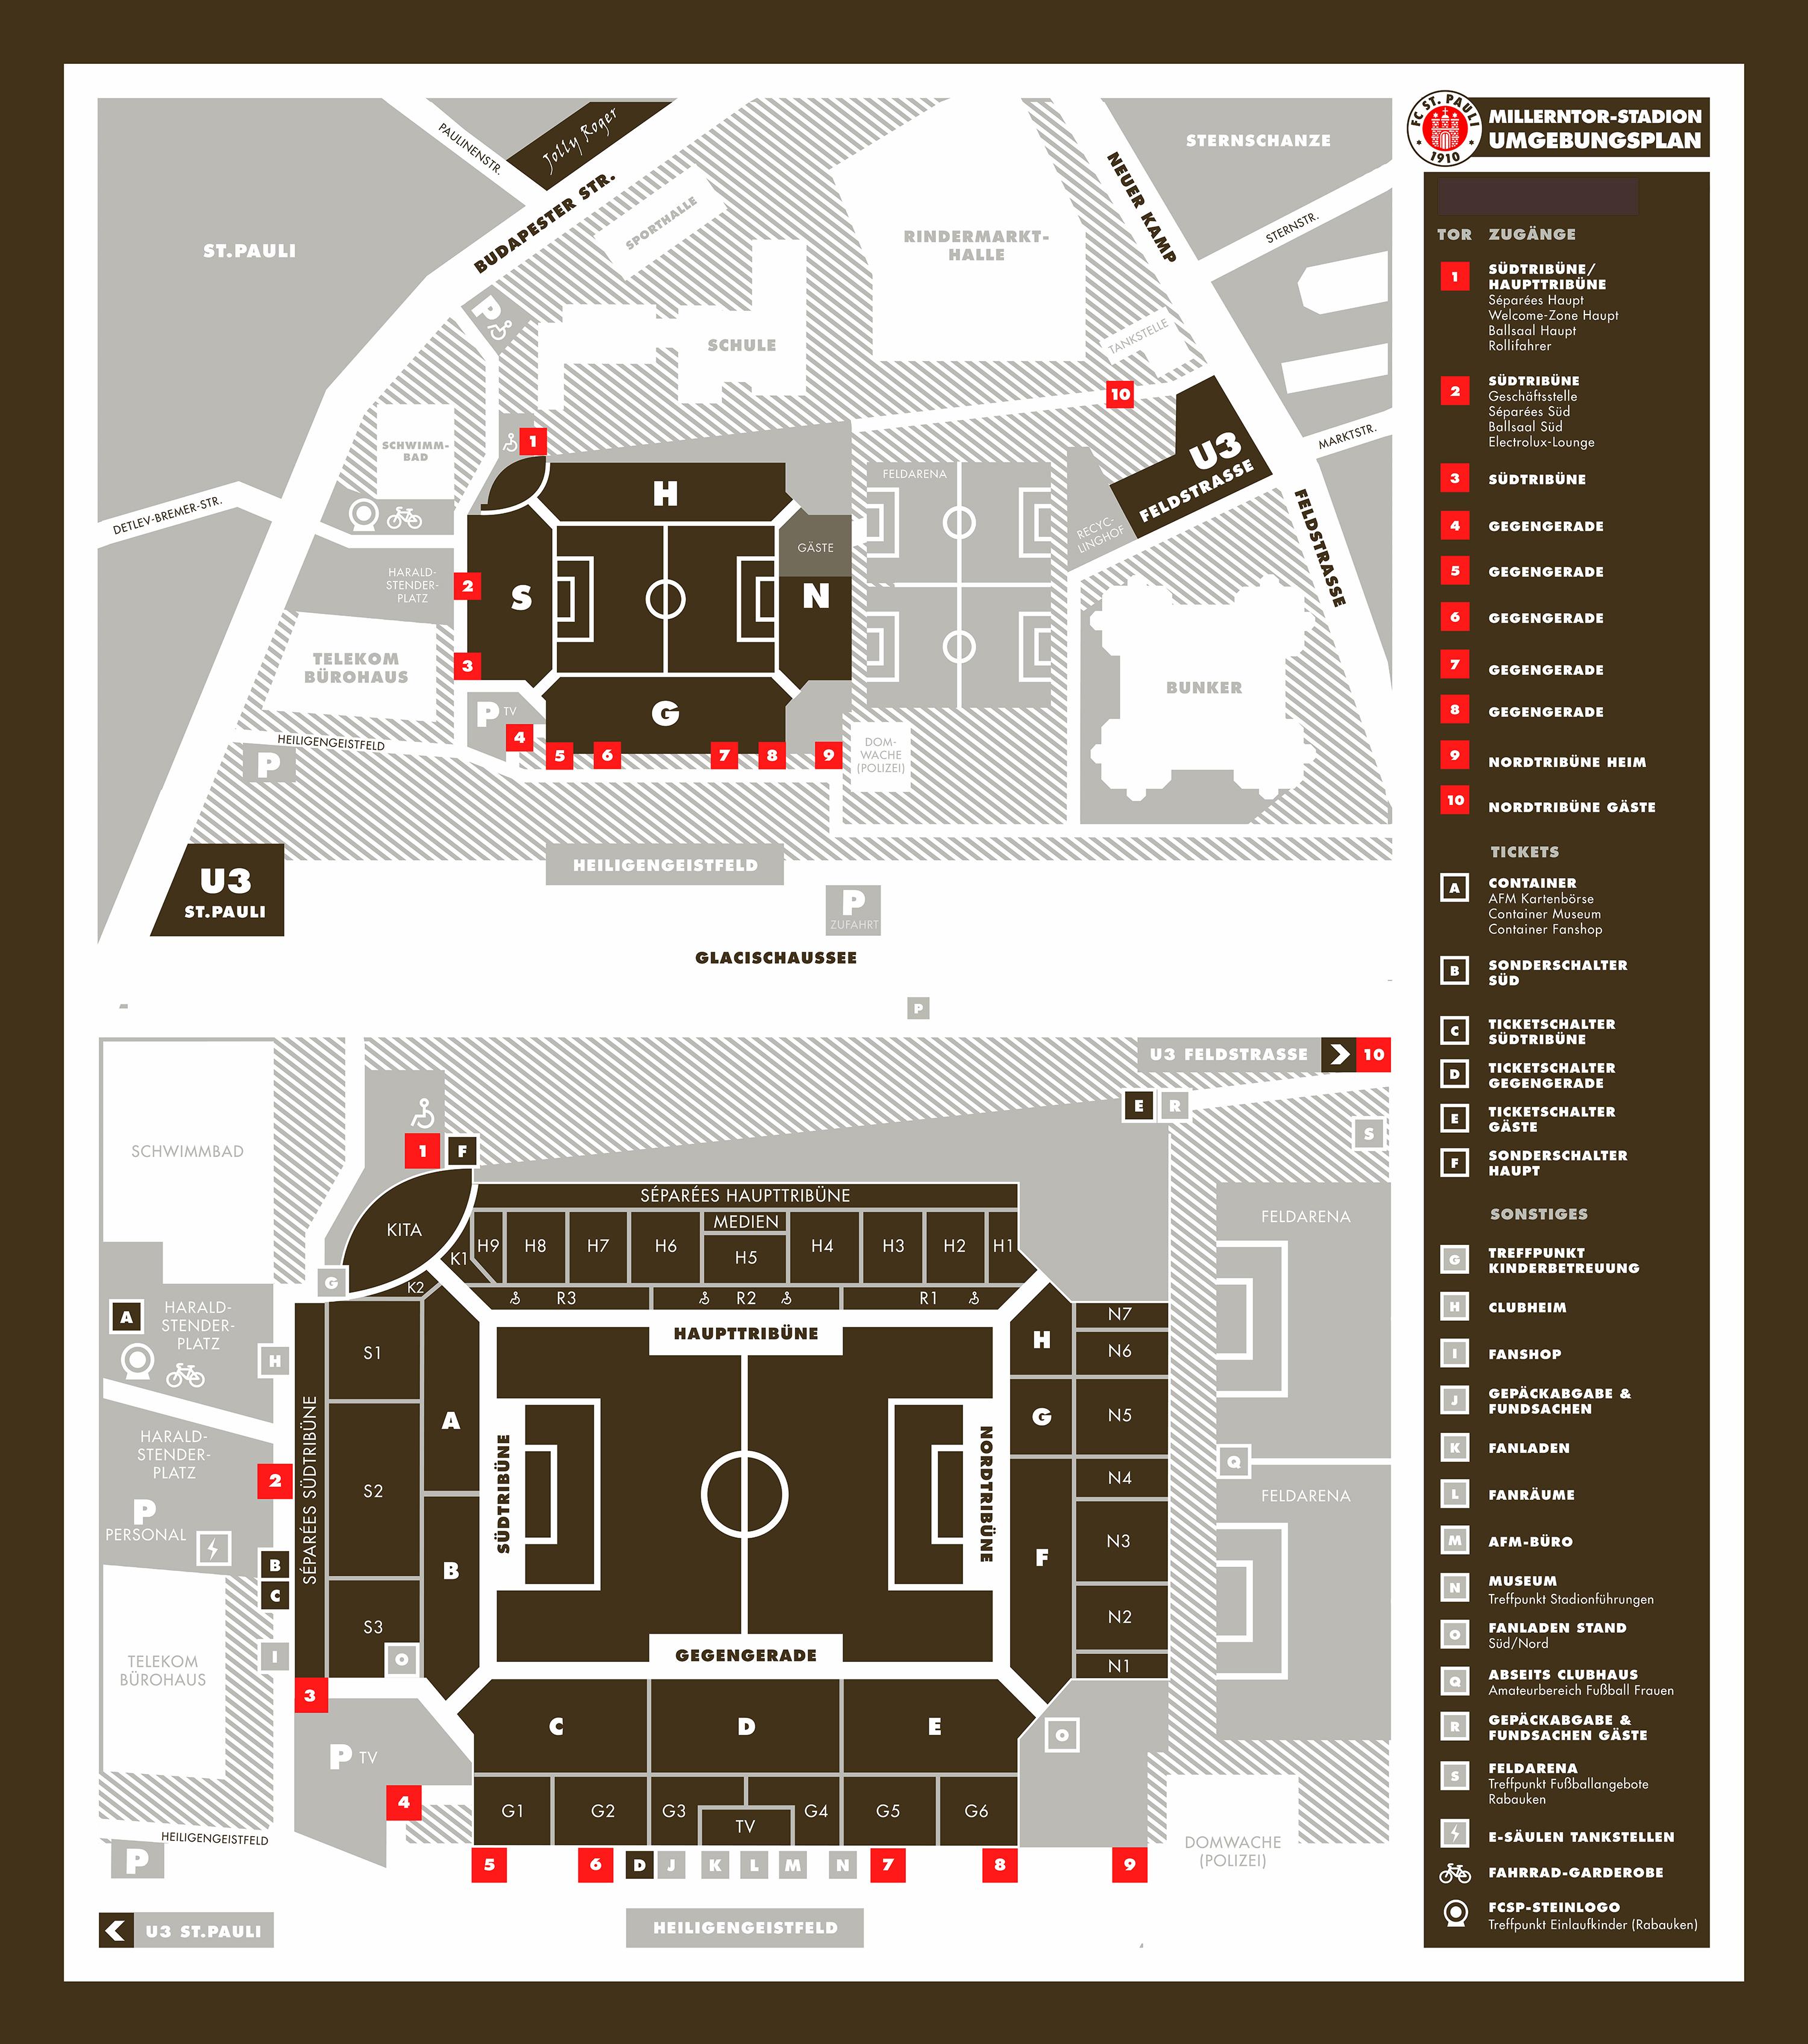 Stadionplan St Pauli